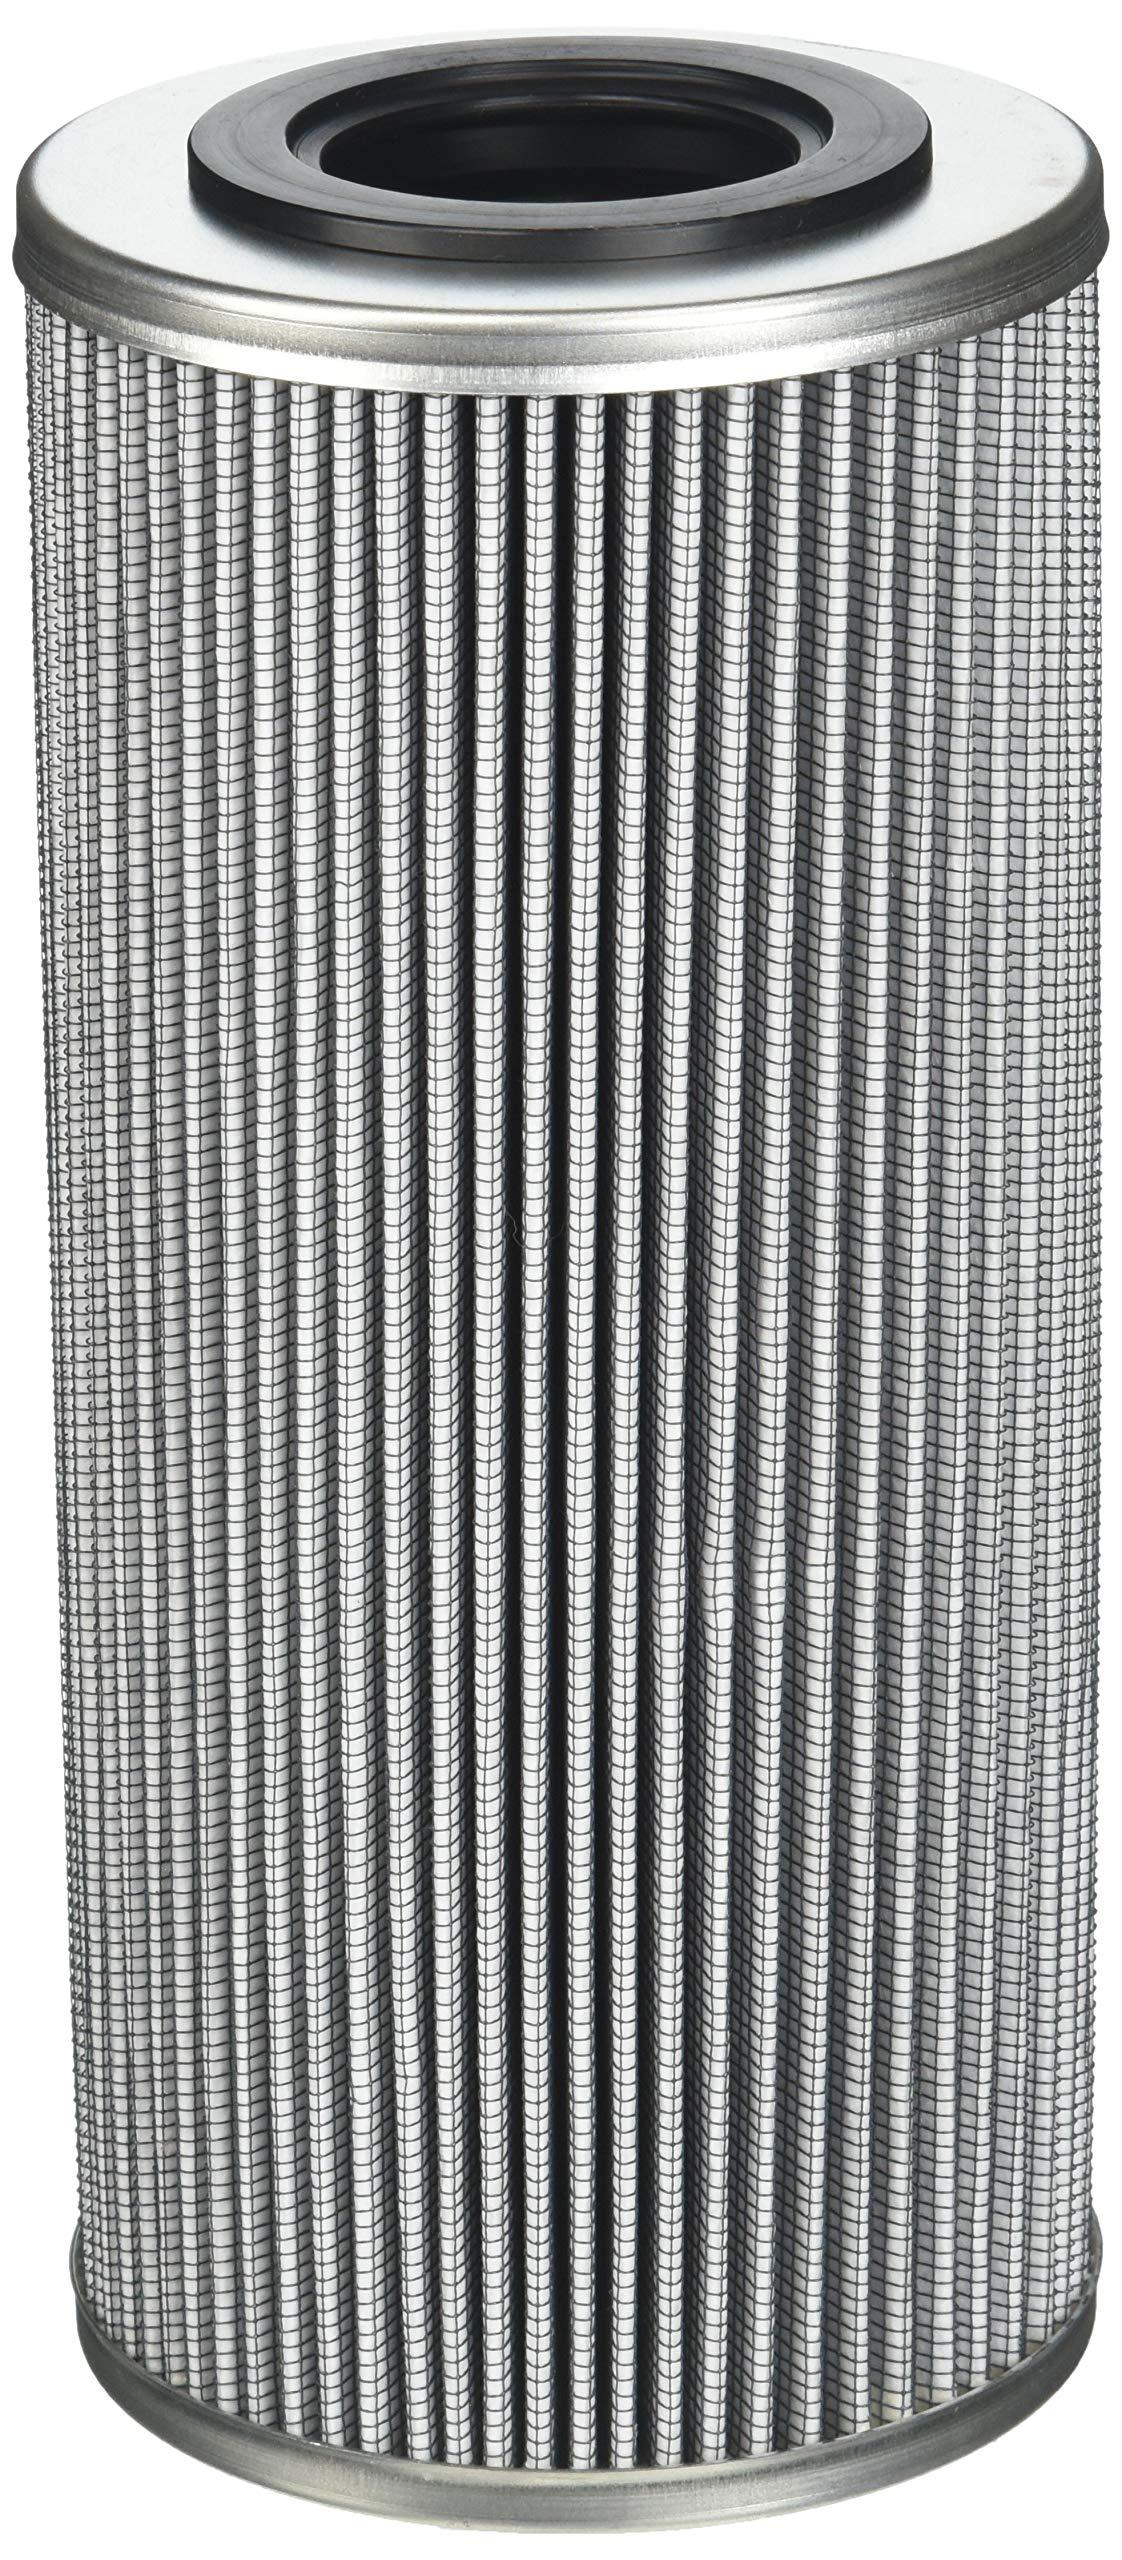 WIX Filters - 57342 Heavy Duty Cartridge Hydraulic Metal, Pack of 1